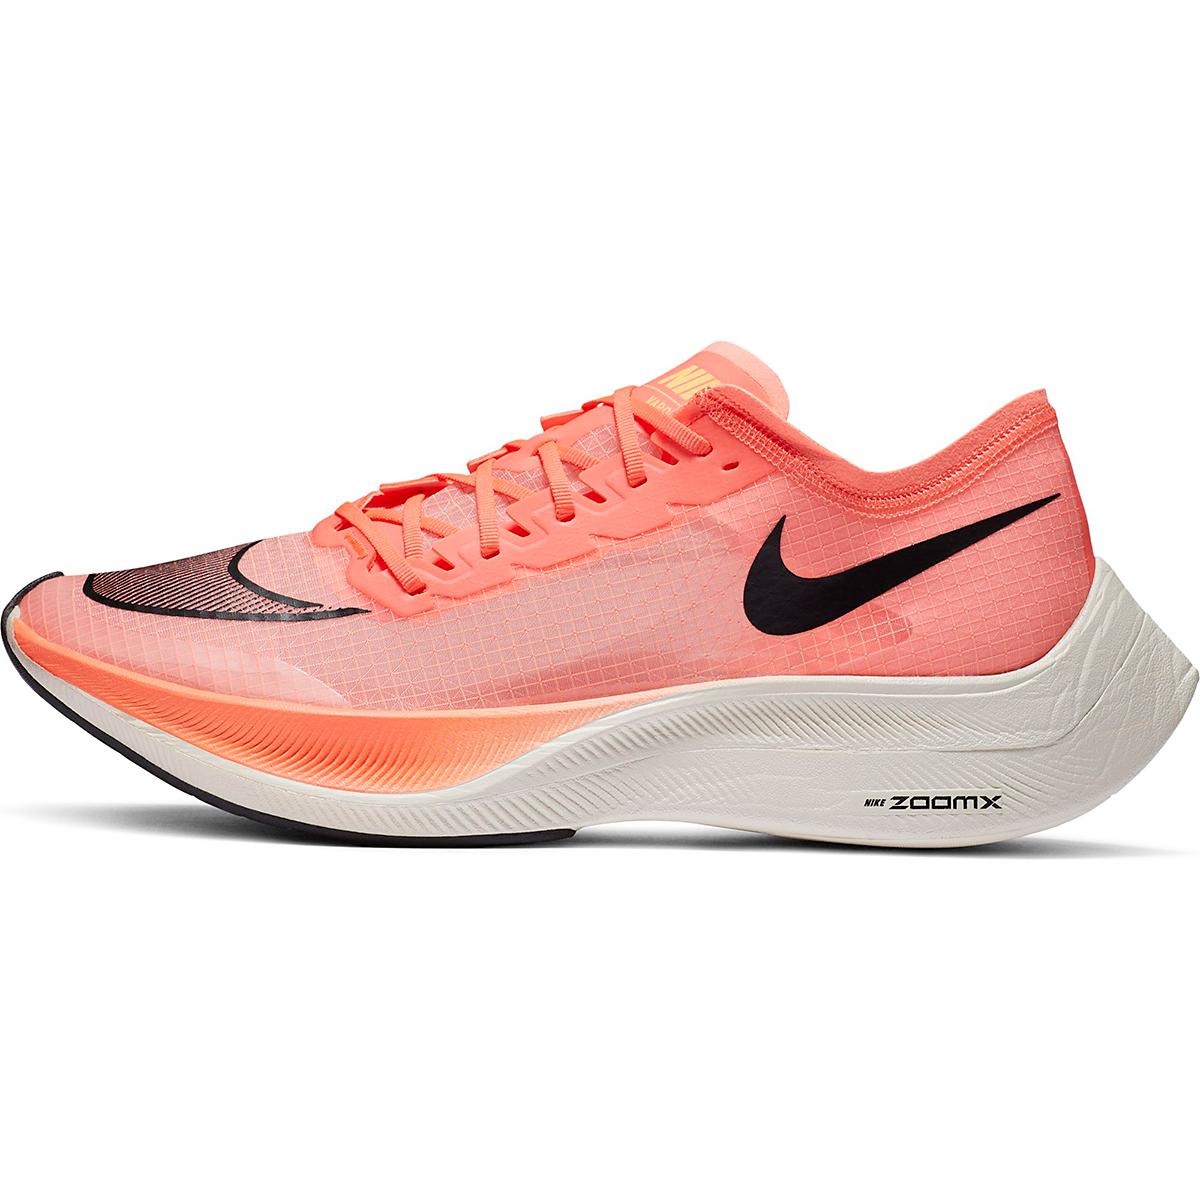 Nike ZoomX Vaporfly NEXT% Running Shoe - Color: Bright Mango/Citron Pulse - Size: M3.5/W5 - Width: Regular, Bright Mango/Citron Pulse, large, image 2